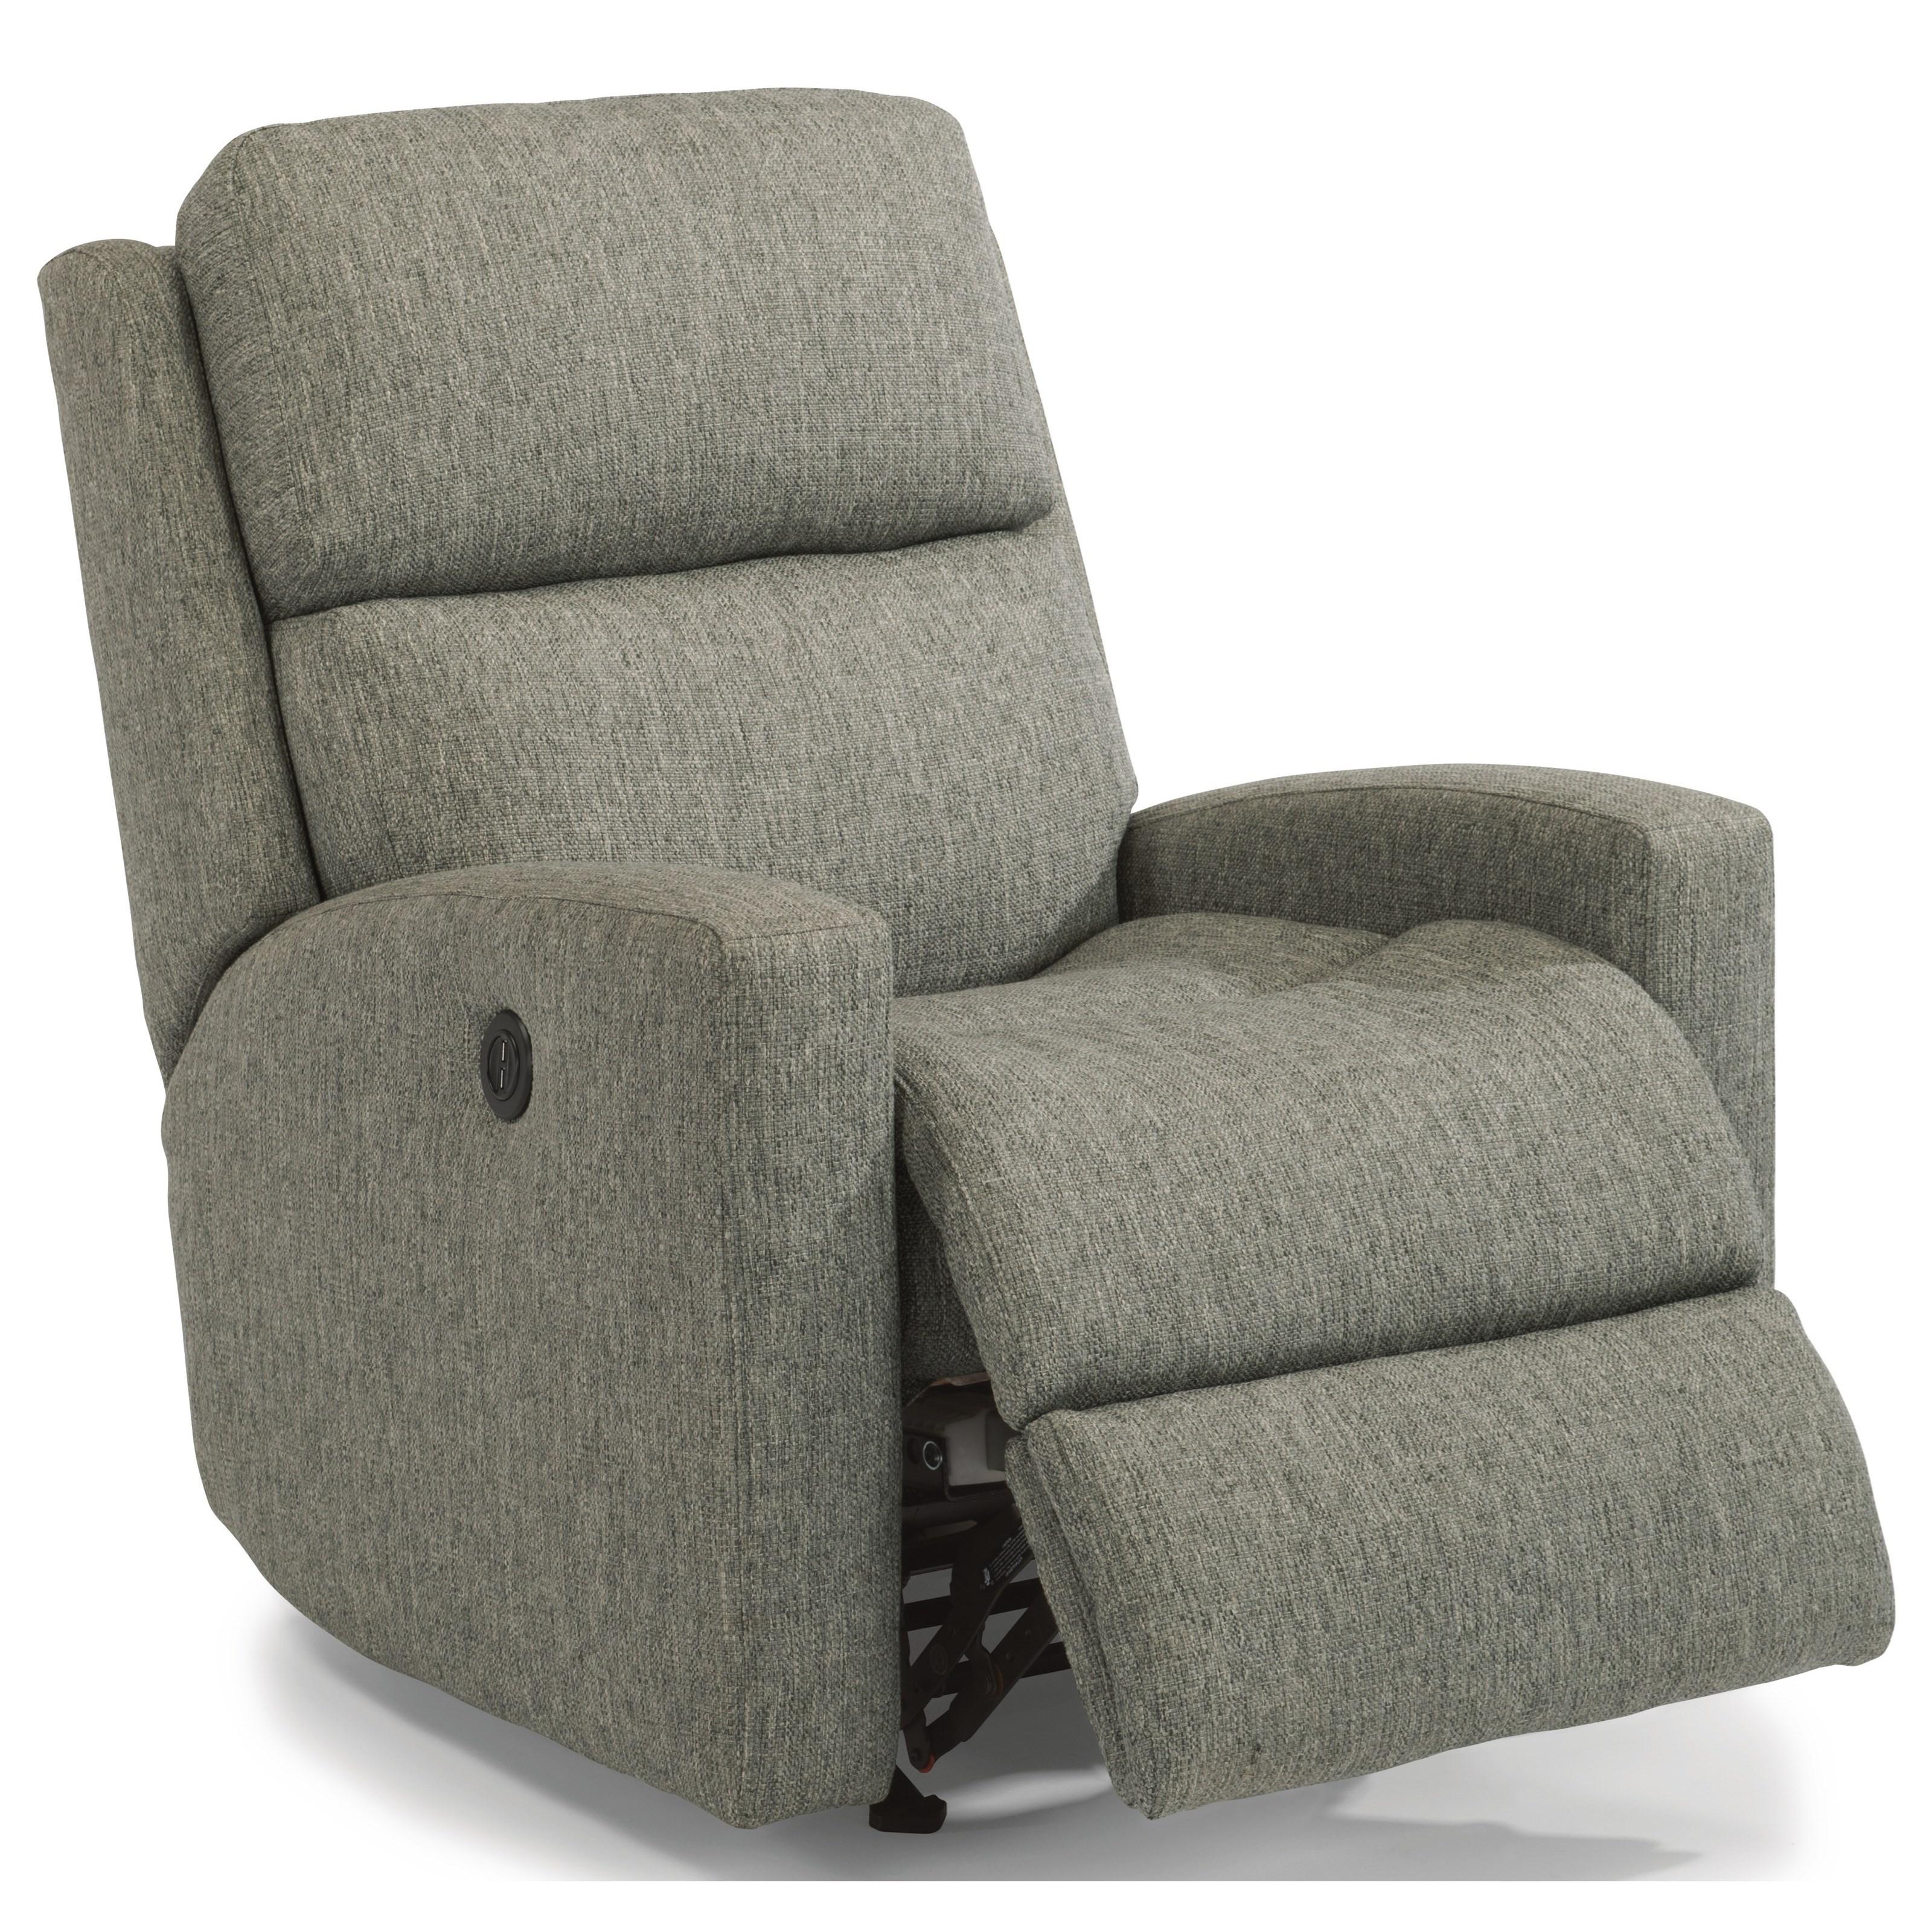 Catalina Power Rock Recliner w/ Pwr Headrest by Flexsteel at Steger's Furniture